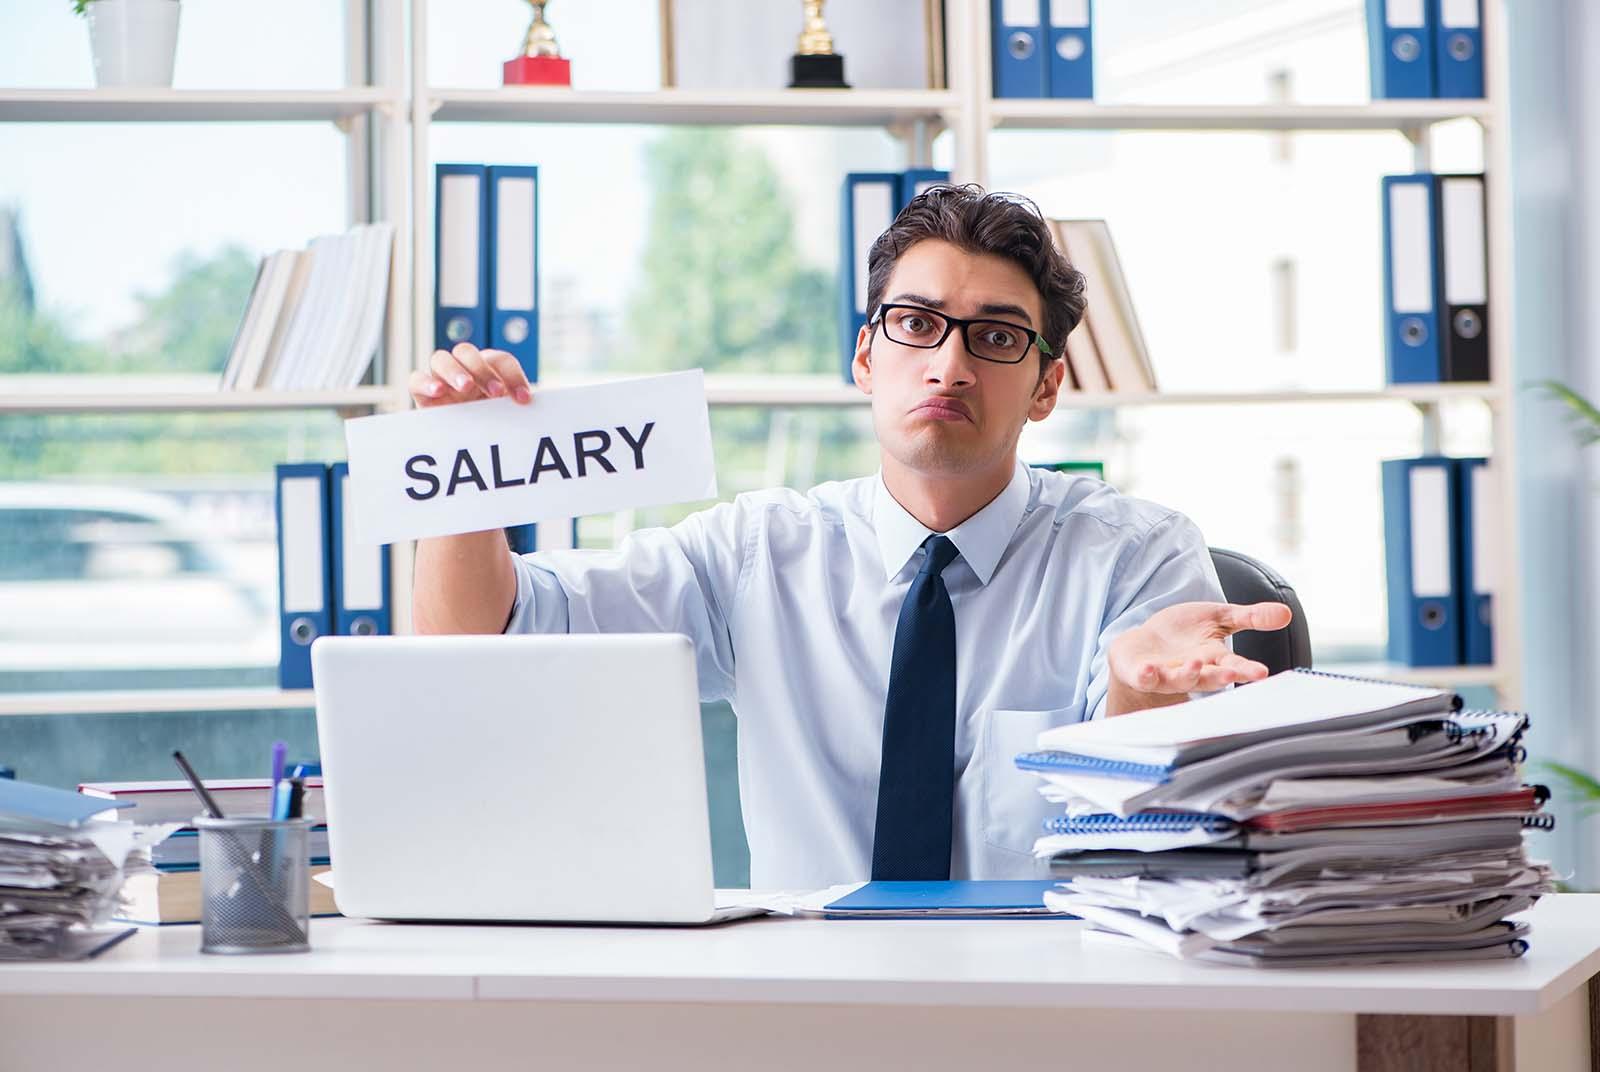 如何寫信跟老闆「提加薪」呢? How to ask for a pay raise? 天下雜誌